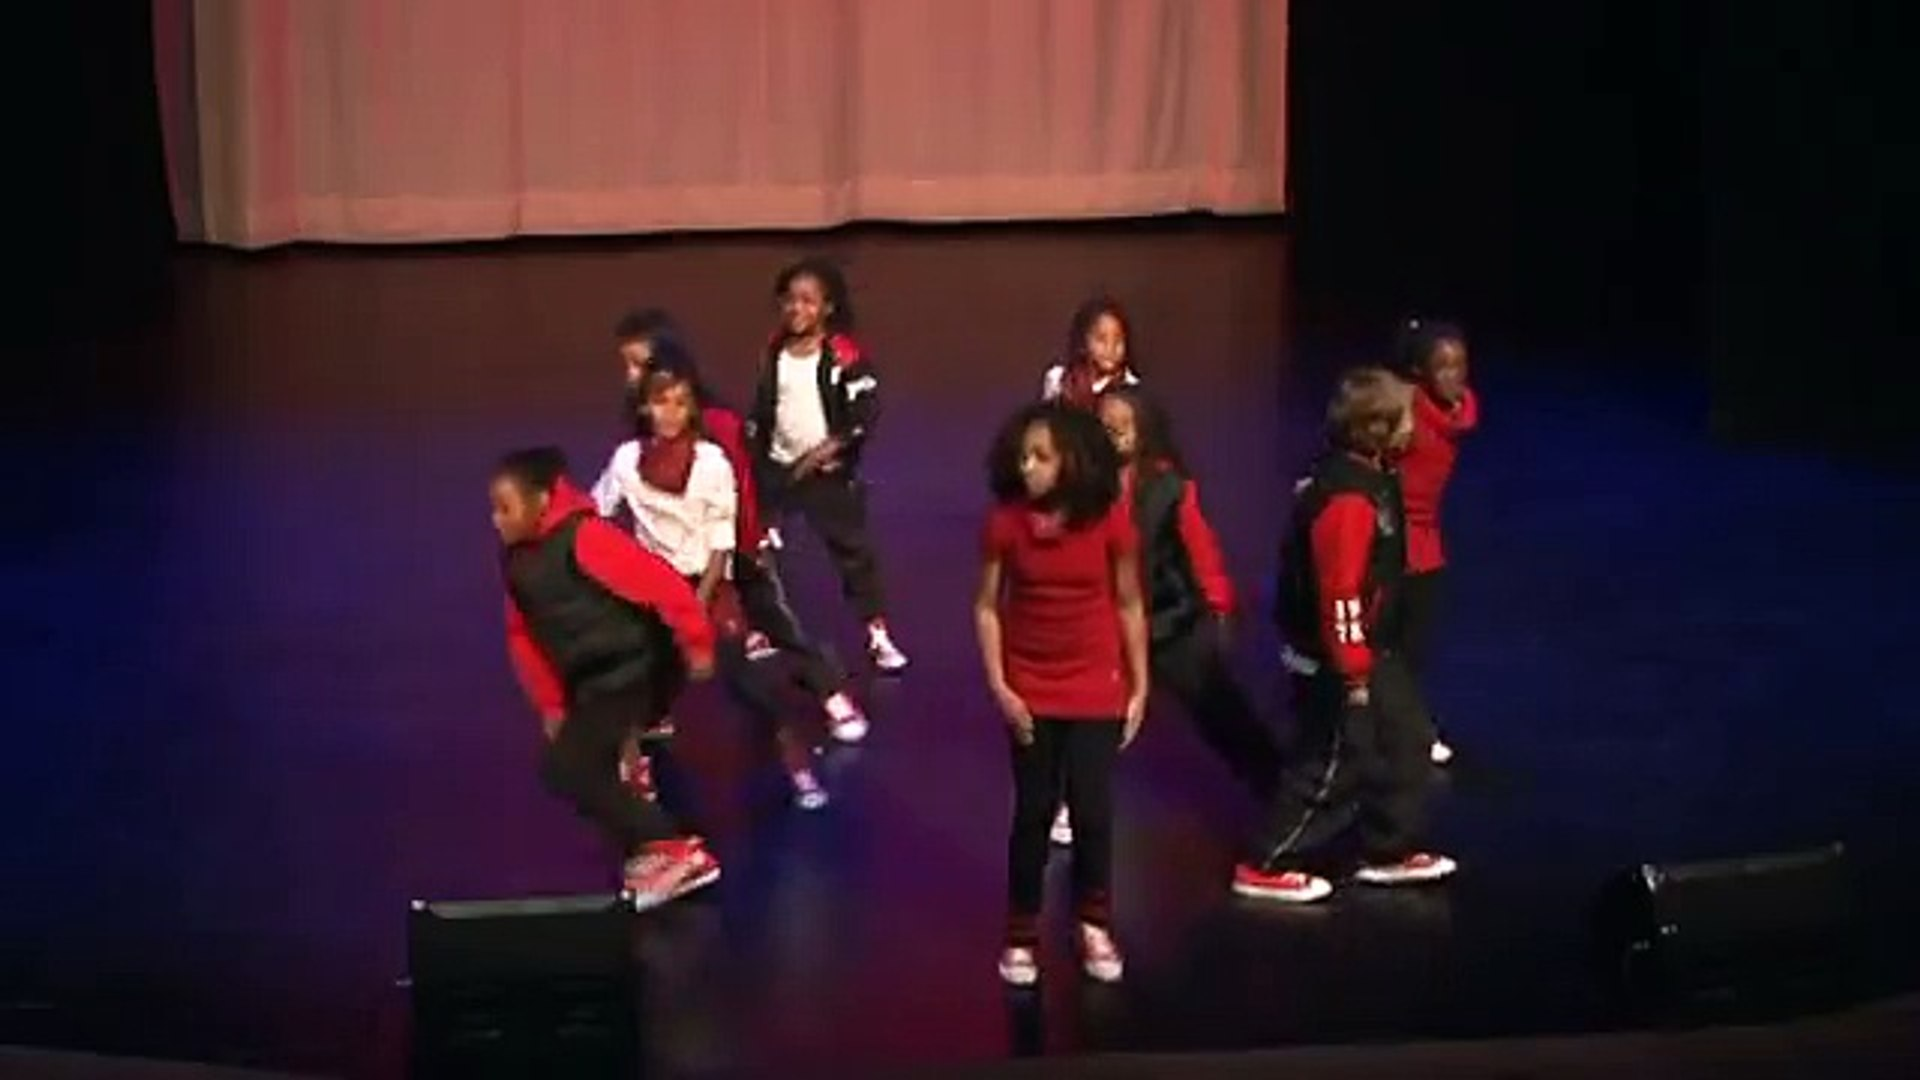 Kids Hip Hop Routine 6-11yrs - J Crew - Pre-Comp Hip Hop